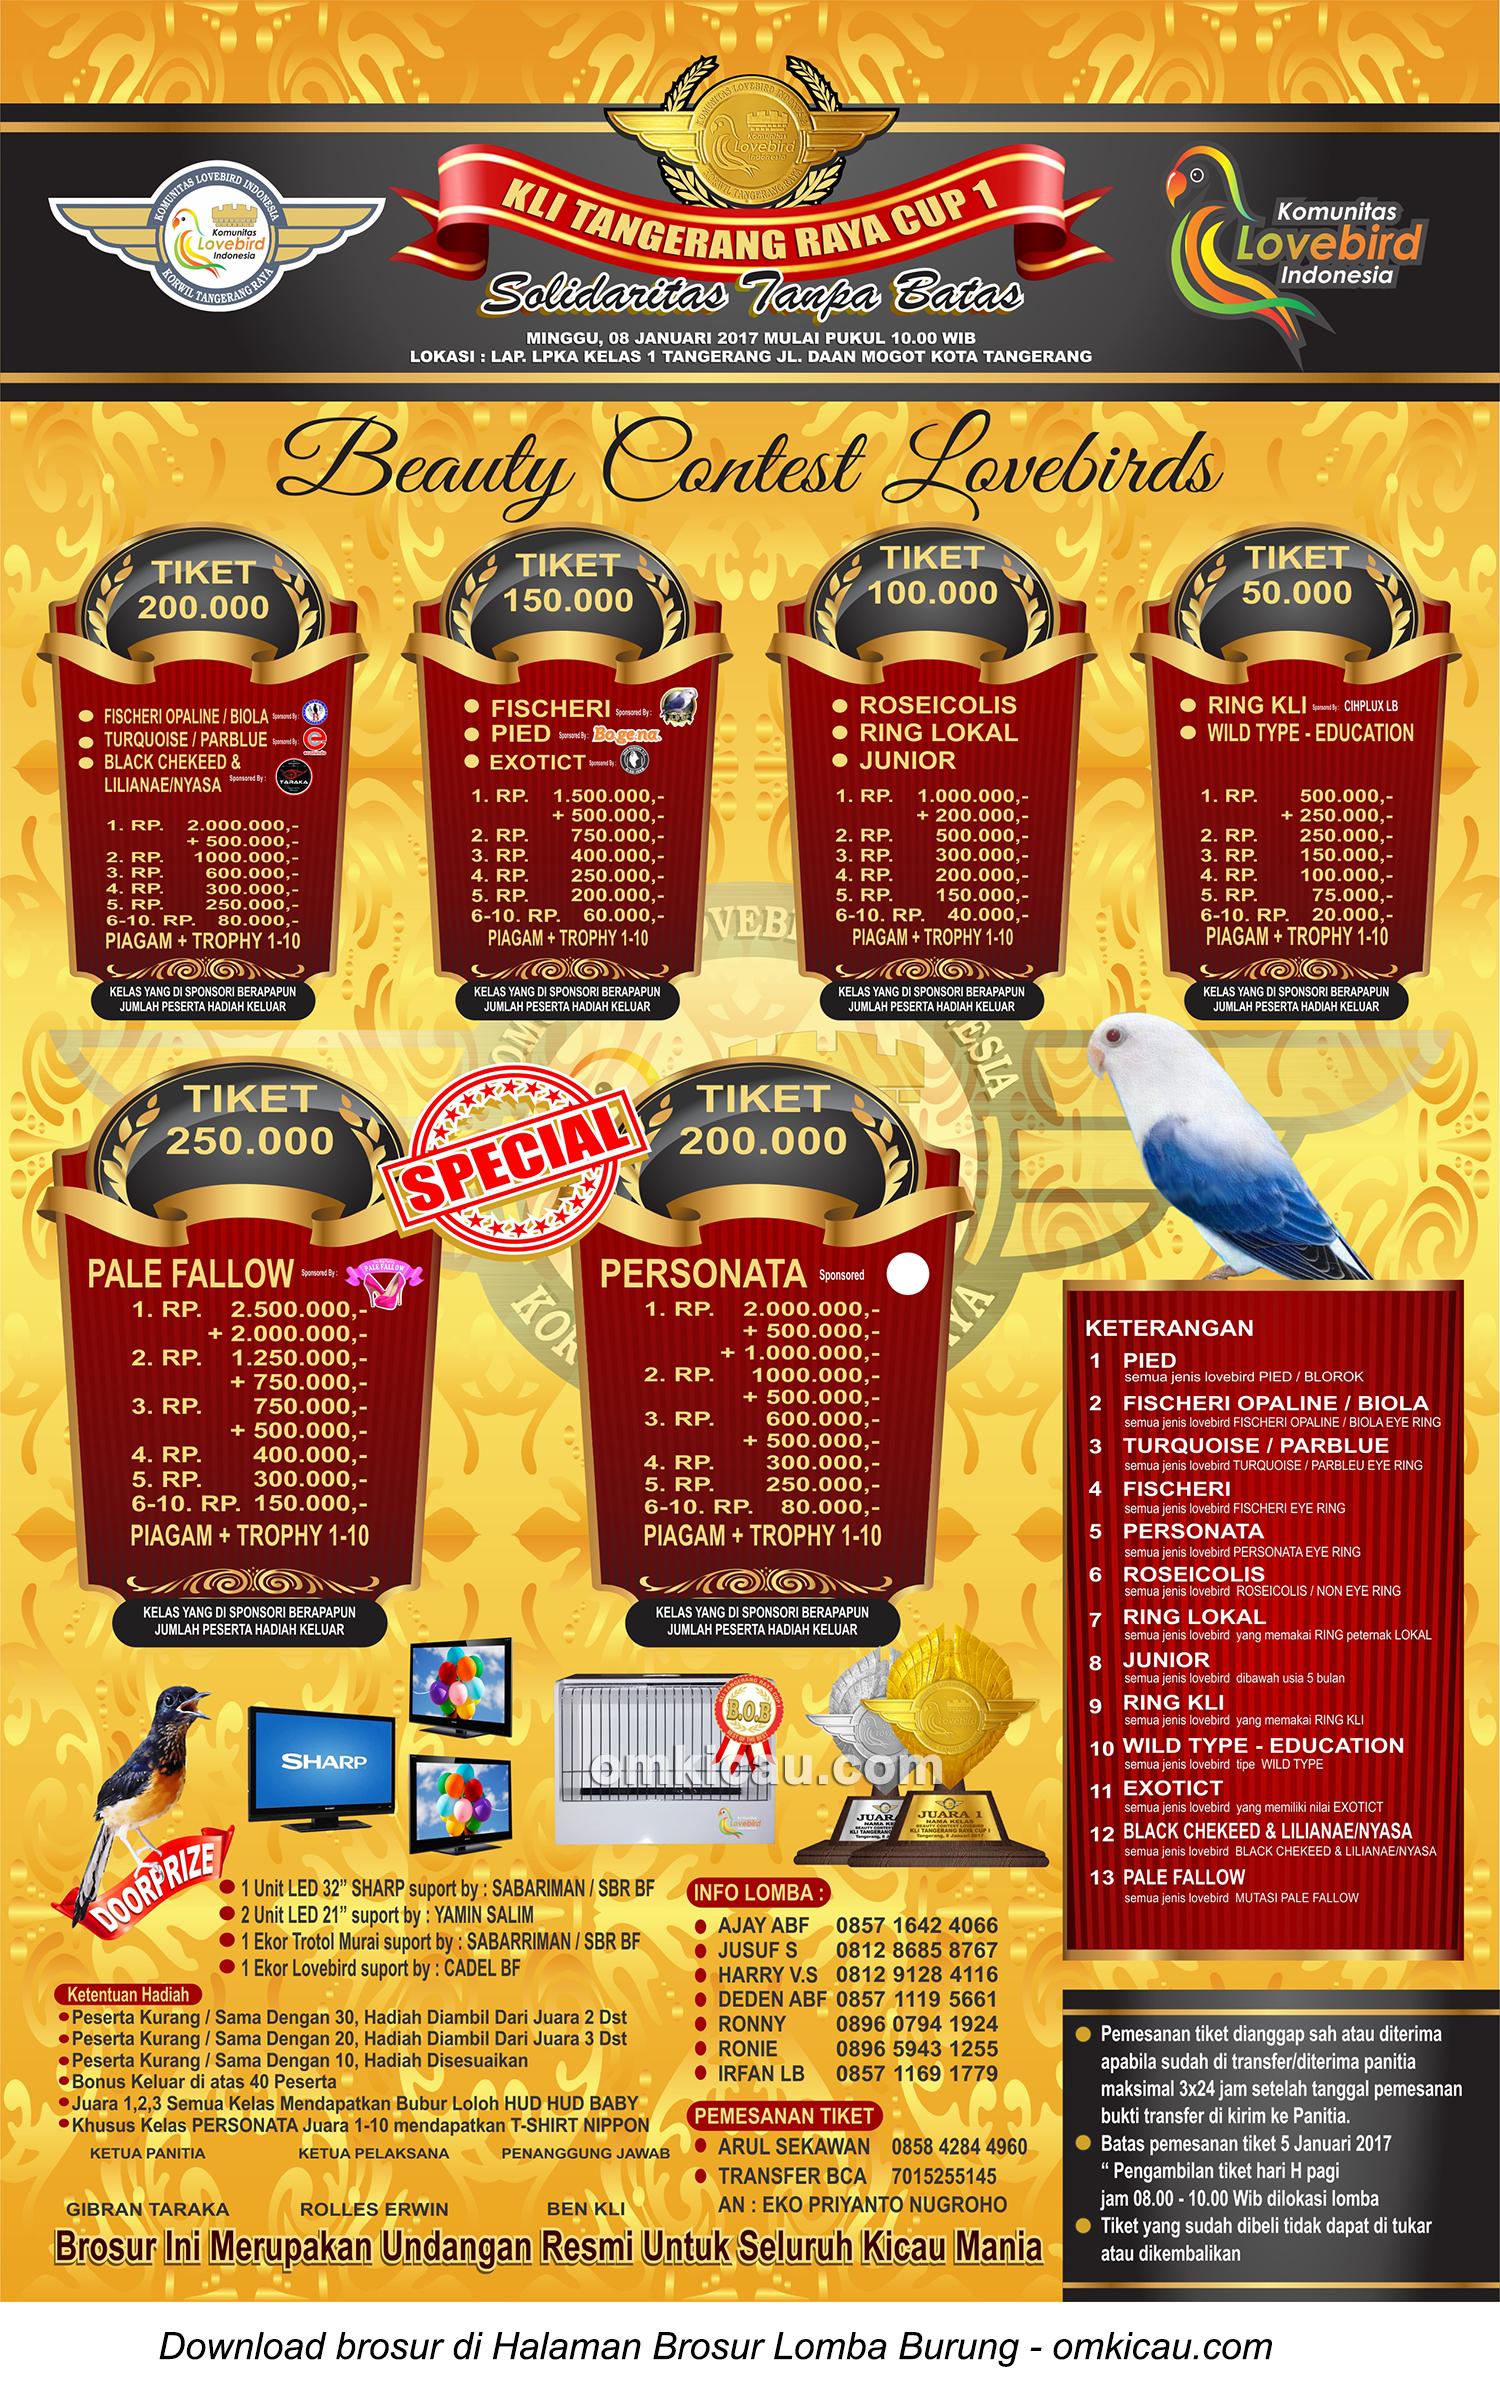 Brosur Beauty Contest Lovebirds KLI Tangerang Raya Cup 1, Kota Tangerang, 8 Januari 2017